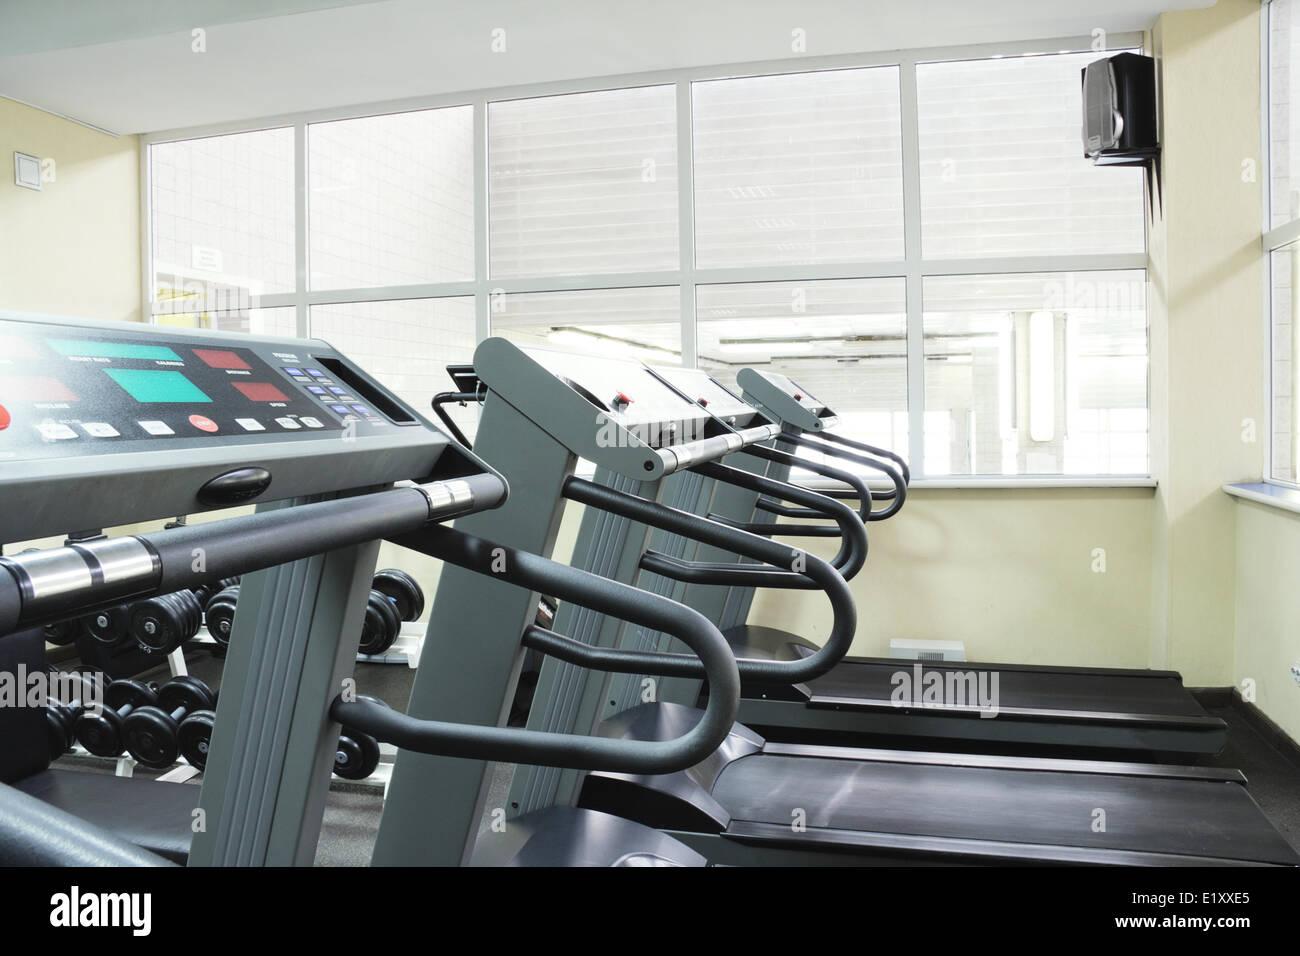 Treadmills - Stock Image